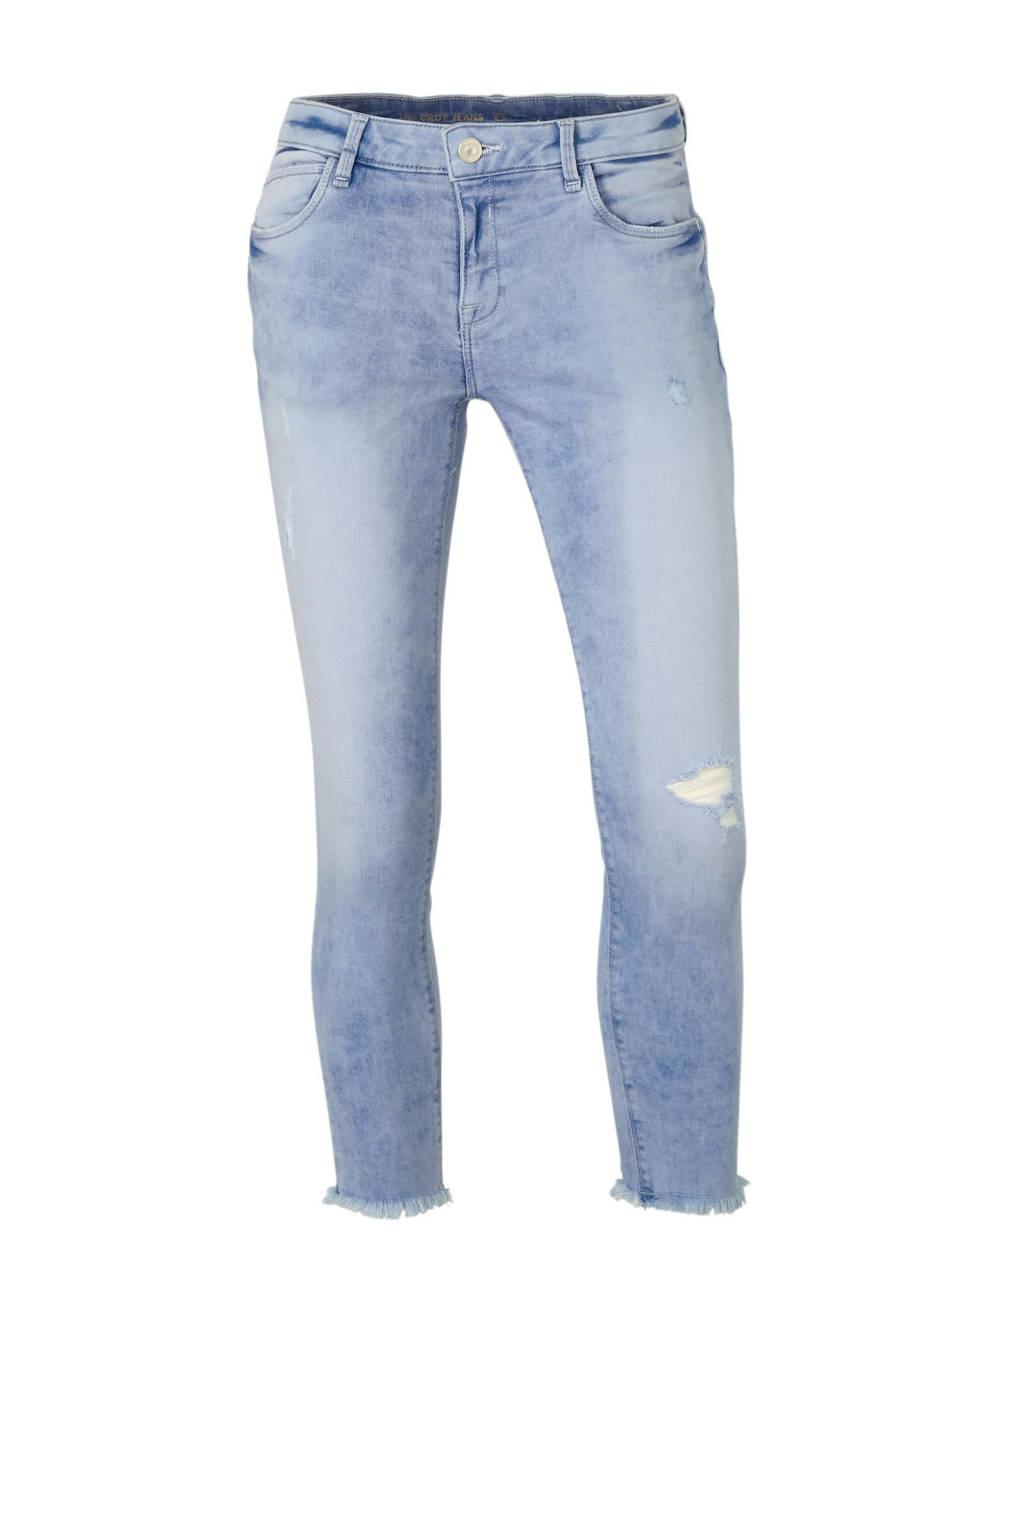 C&A The Denim skinny jeans, Stonewashed